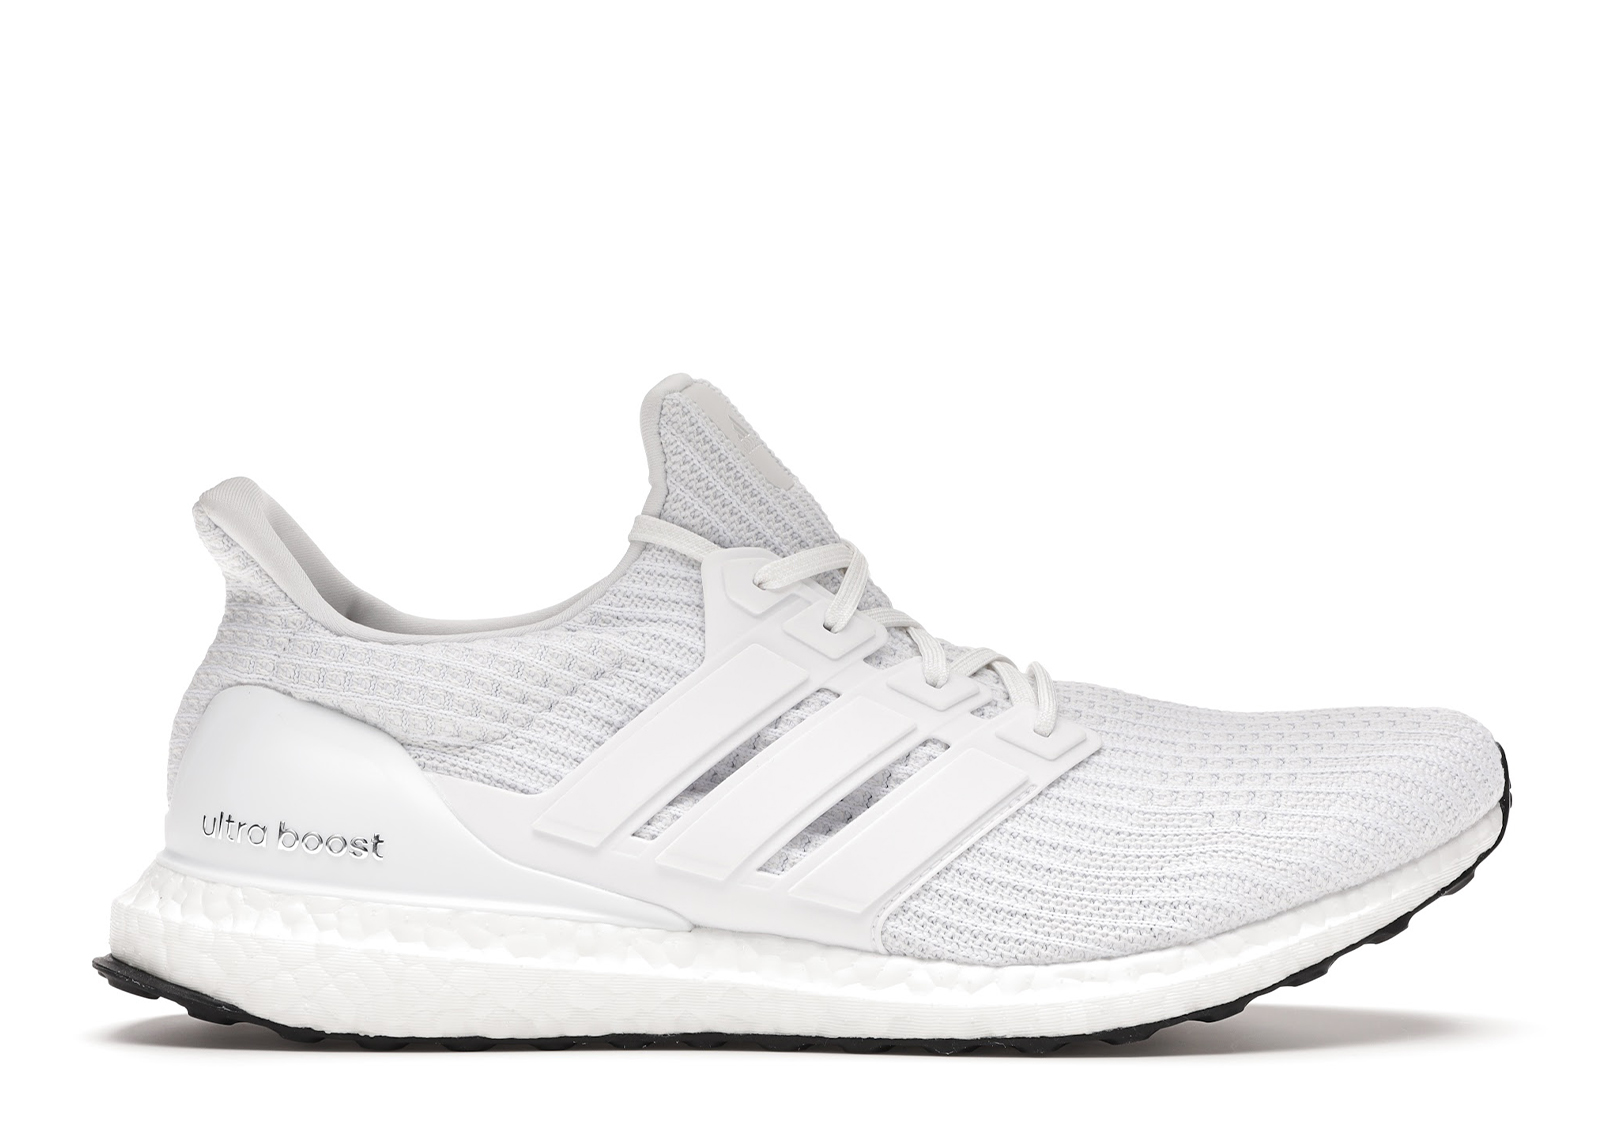 adidas Ultra Boost 4.0 Running White